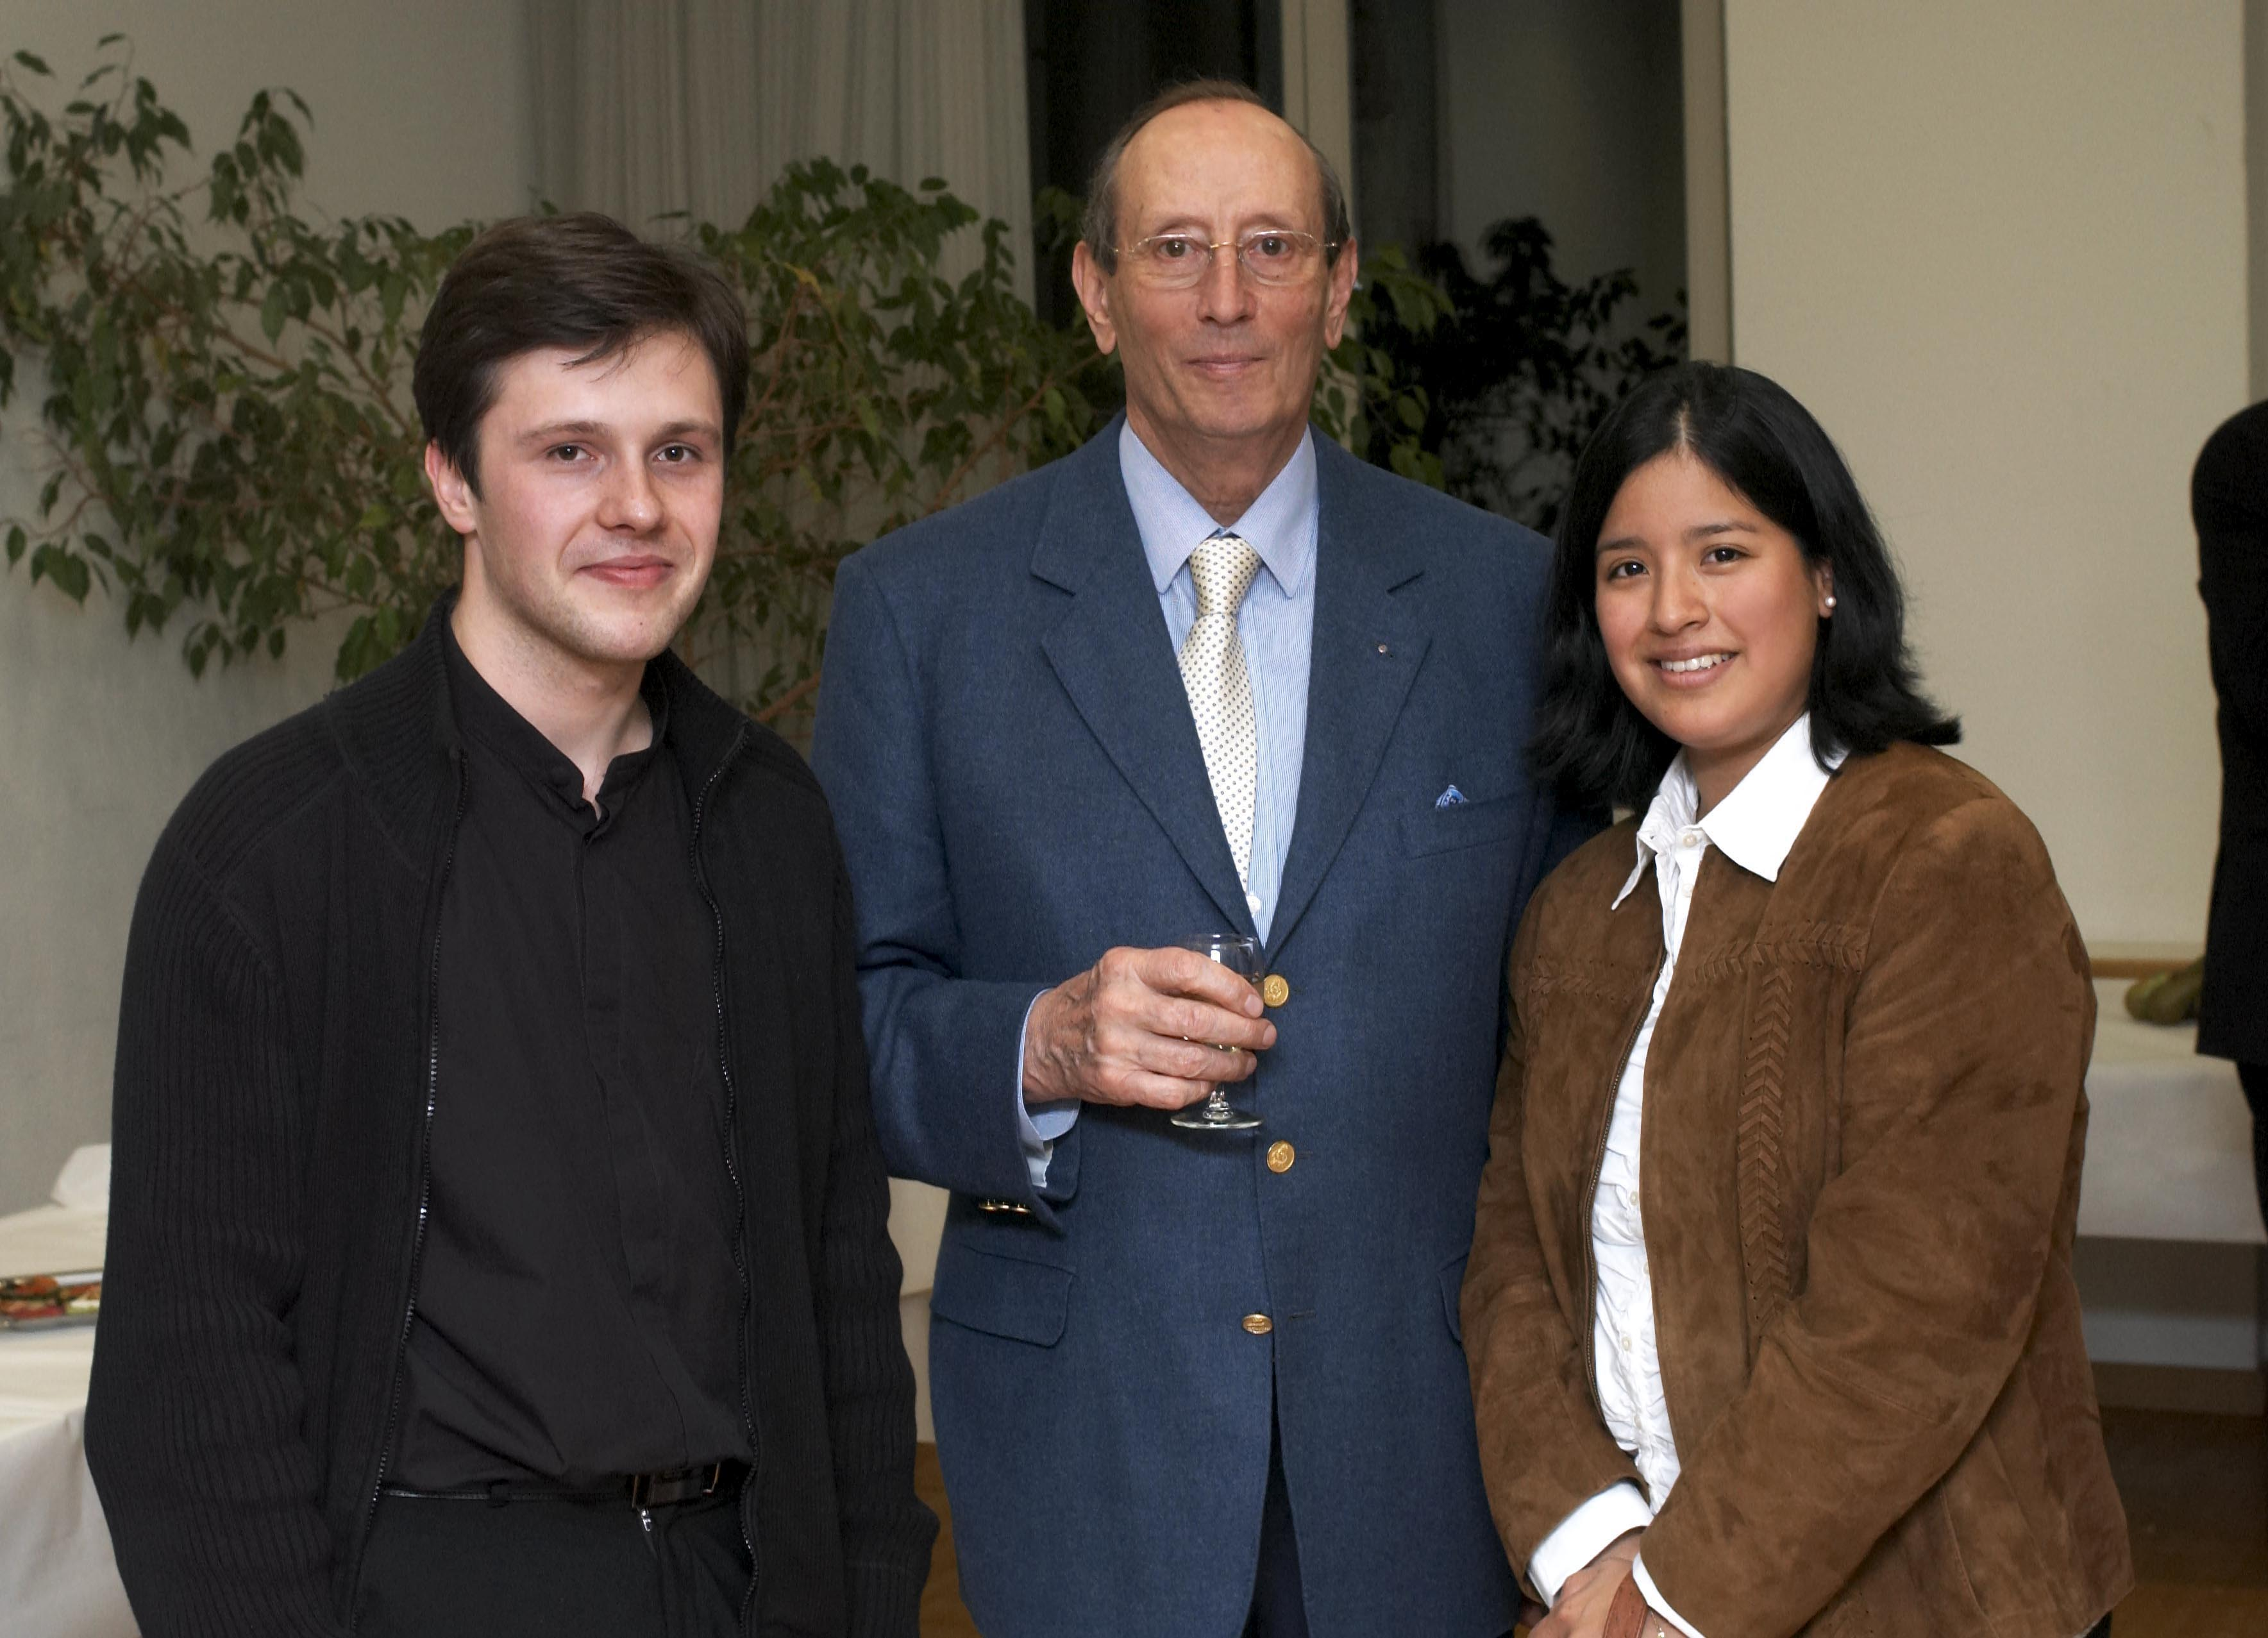 Rahn Musikpreis 2006, Alexander Grytsayenko, H.K. Rahn, Ana P. Rahn Erden